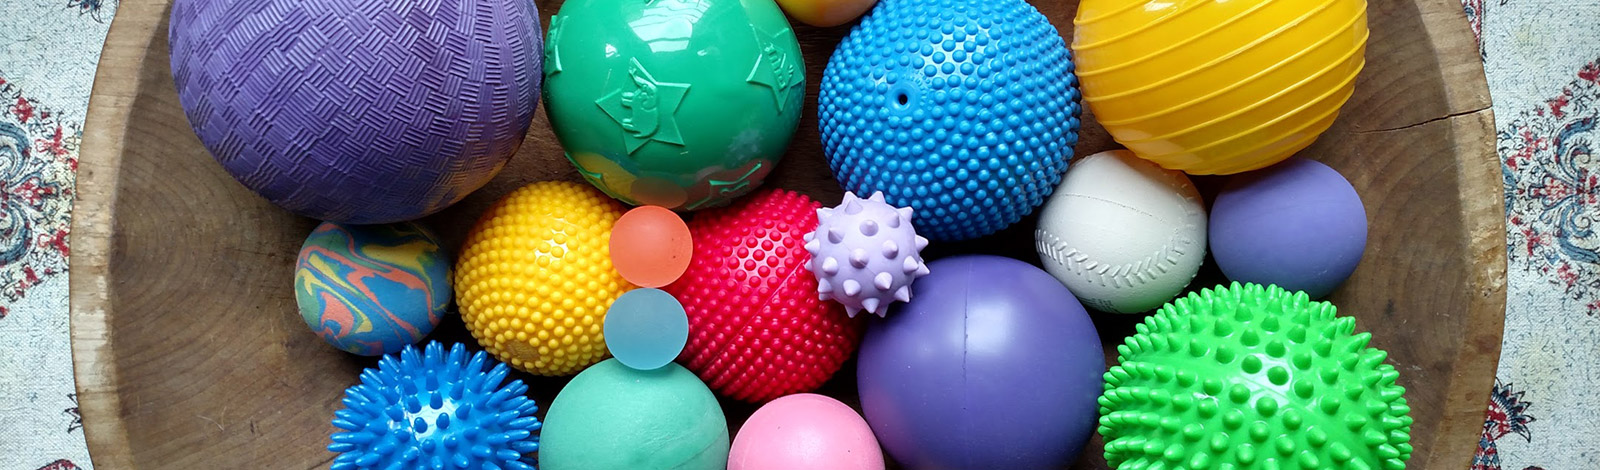 Ballwork-Saltonstall-Balls.jpg